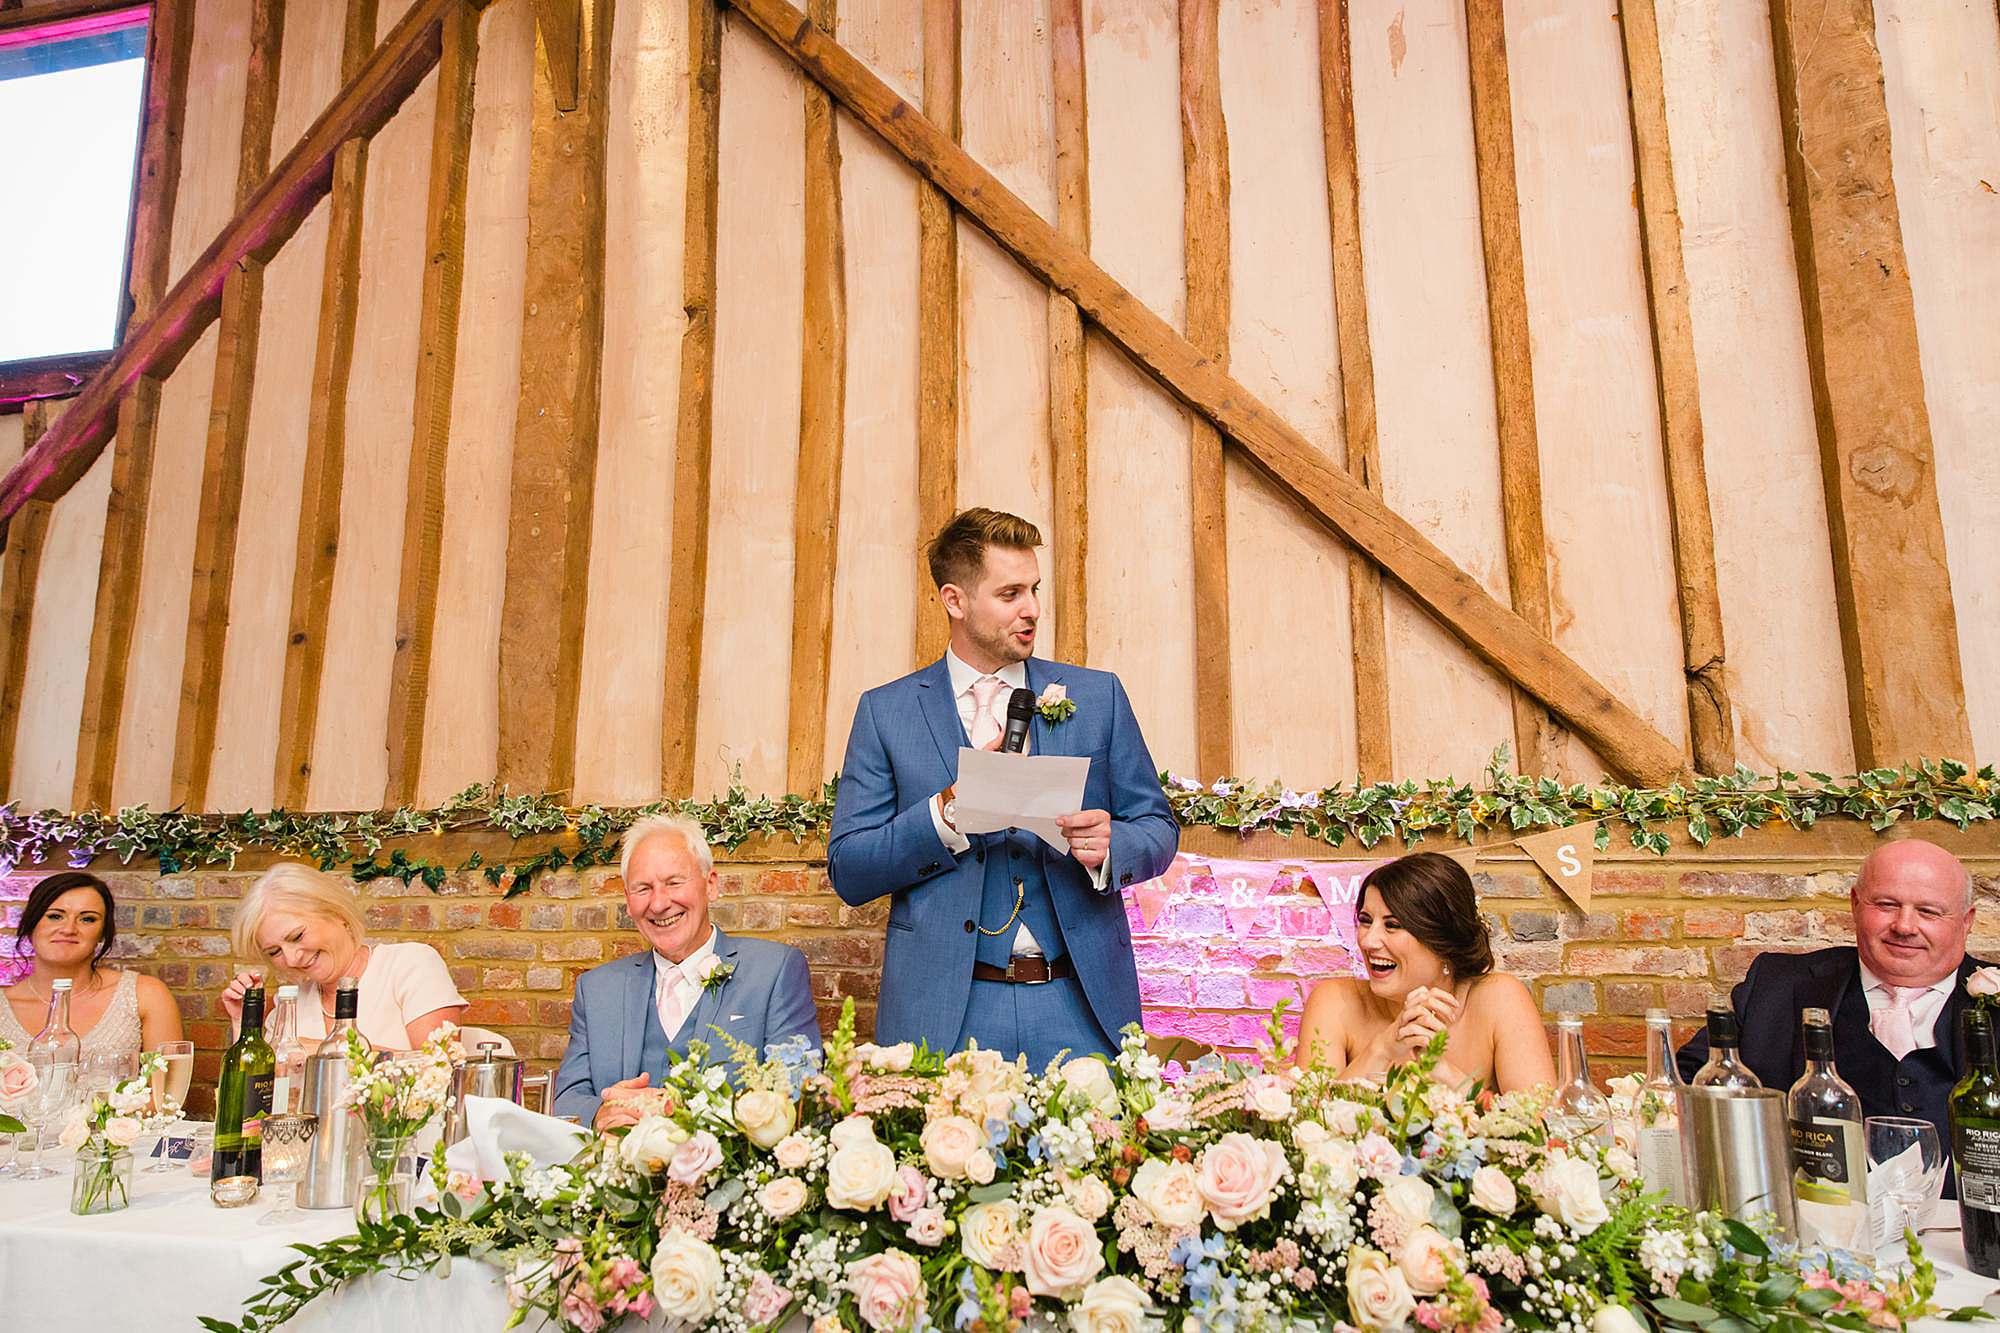 Lillibrooke Manor wedding groom giving speech